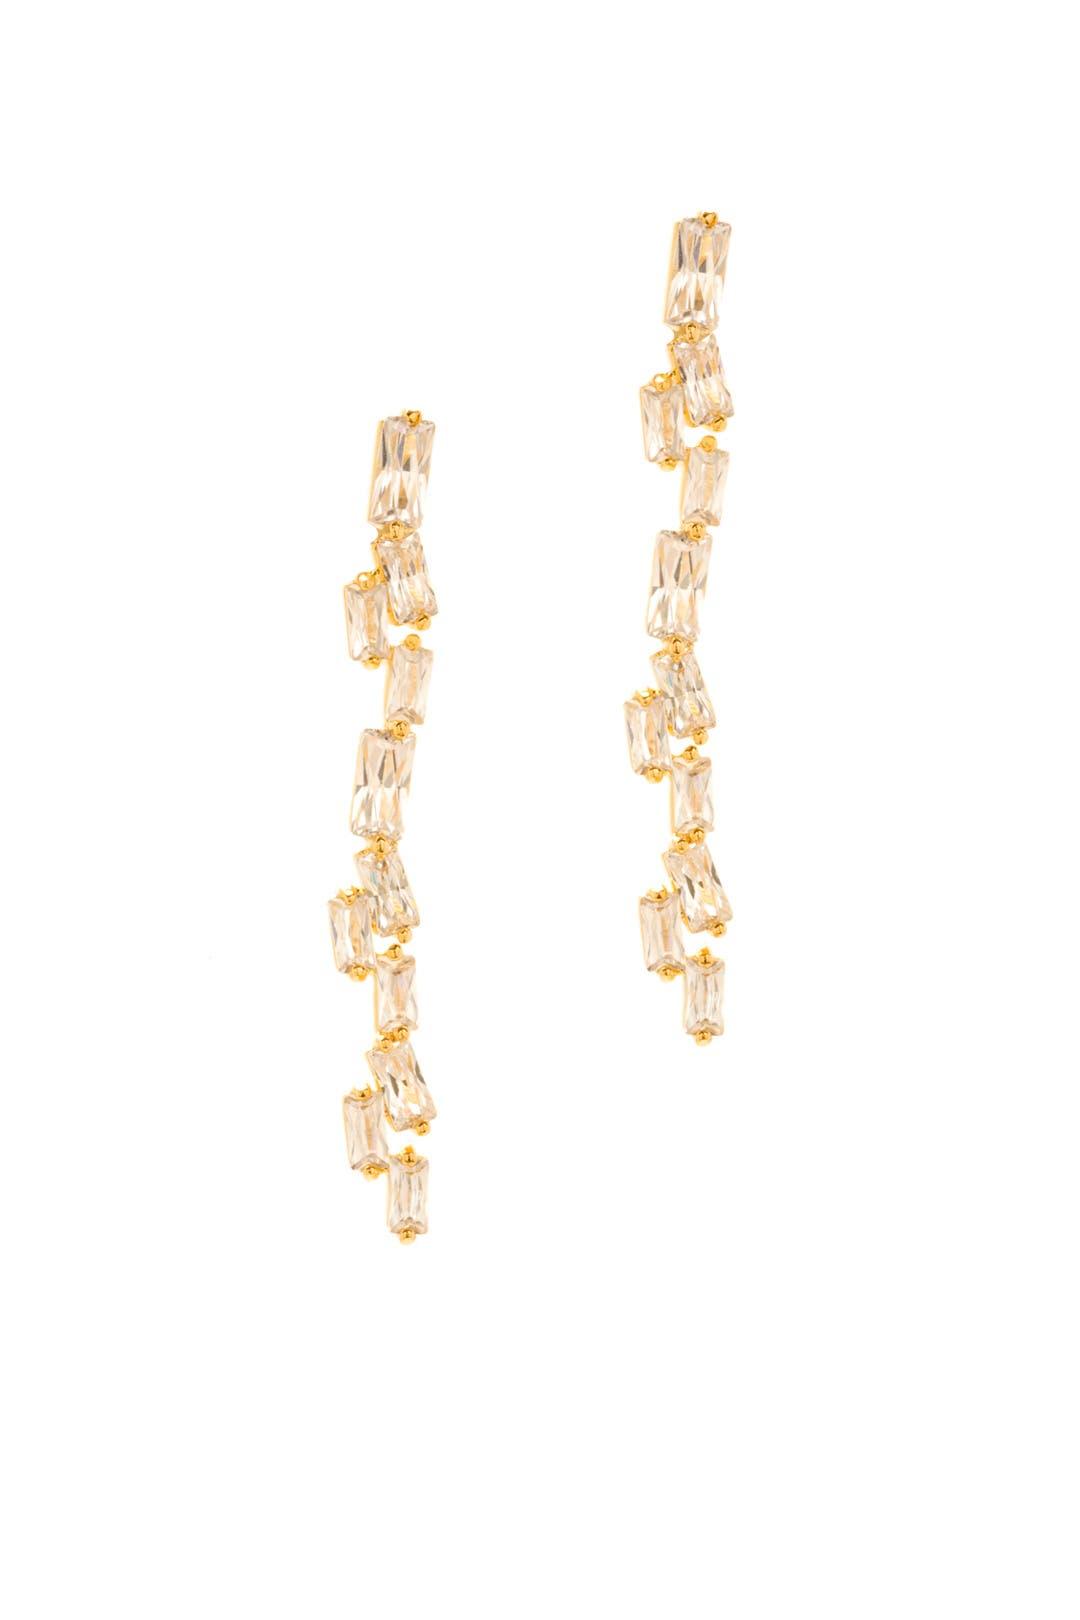 Amara Amara Diamante Gold Drop Pearl Earrings 9umxSYx